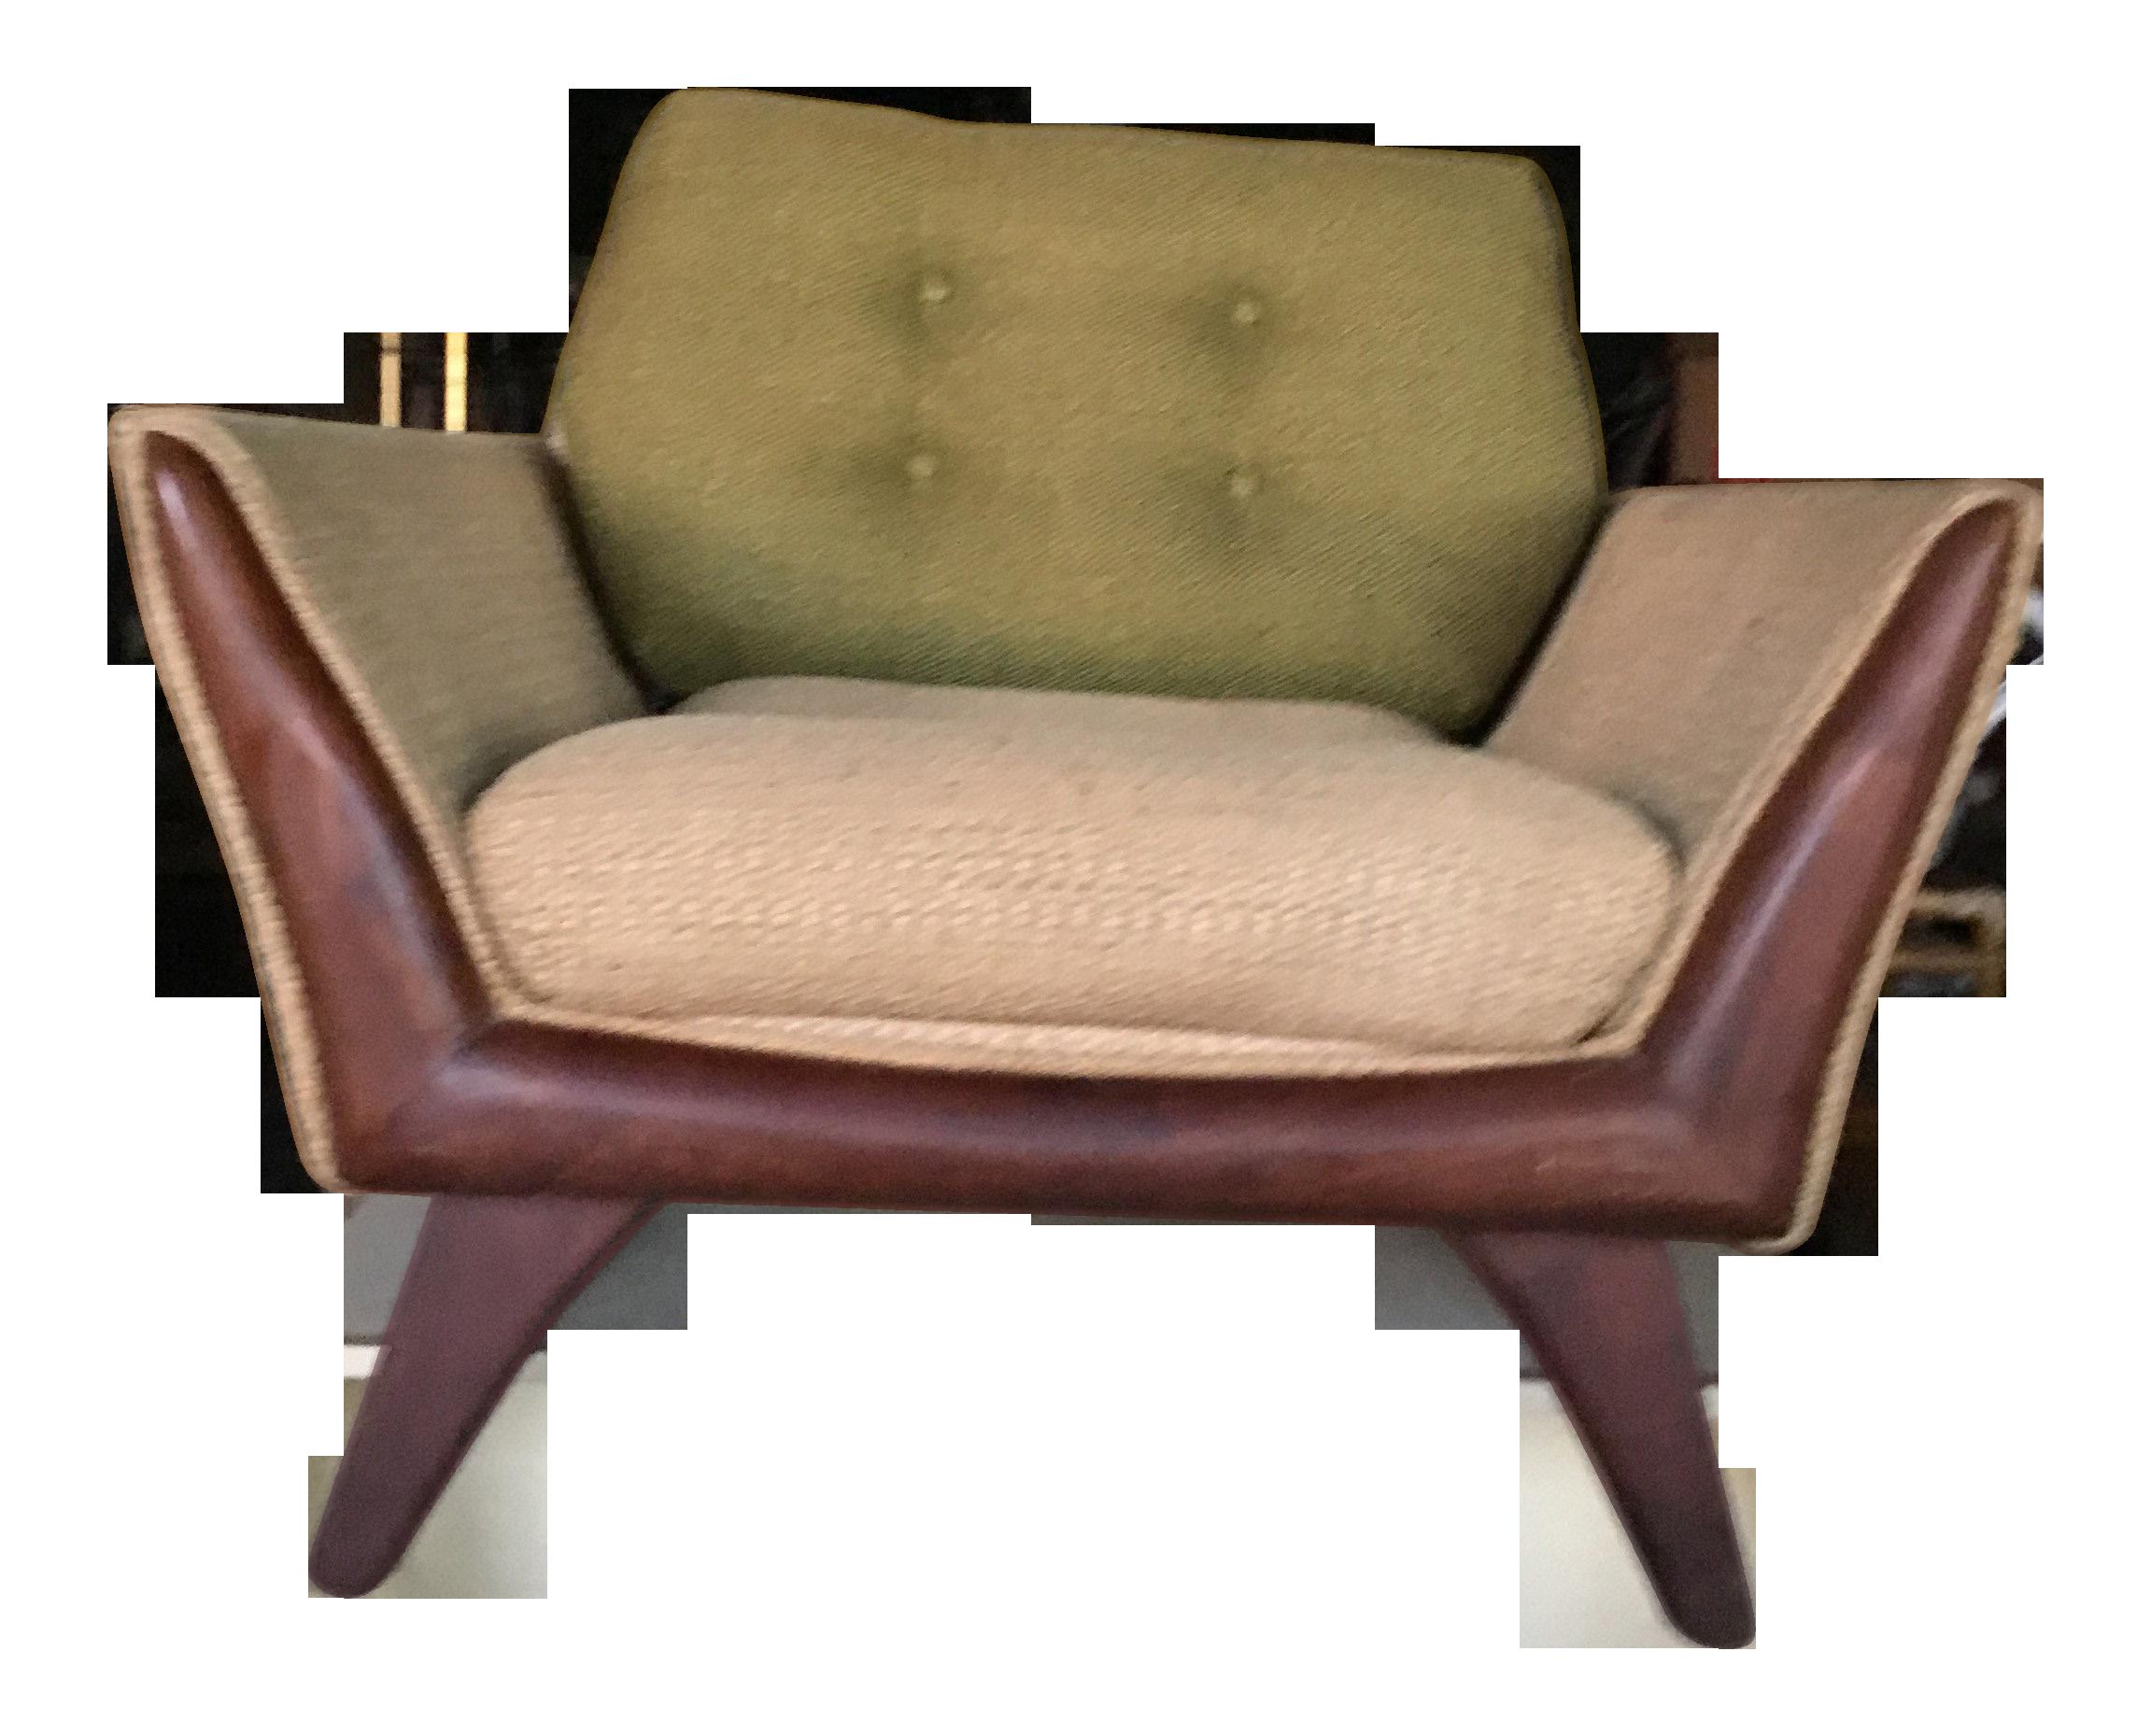 Kraft Associates Mid Century Modern Upholstered Chair With Walnut Legs